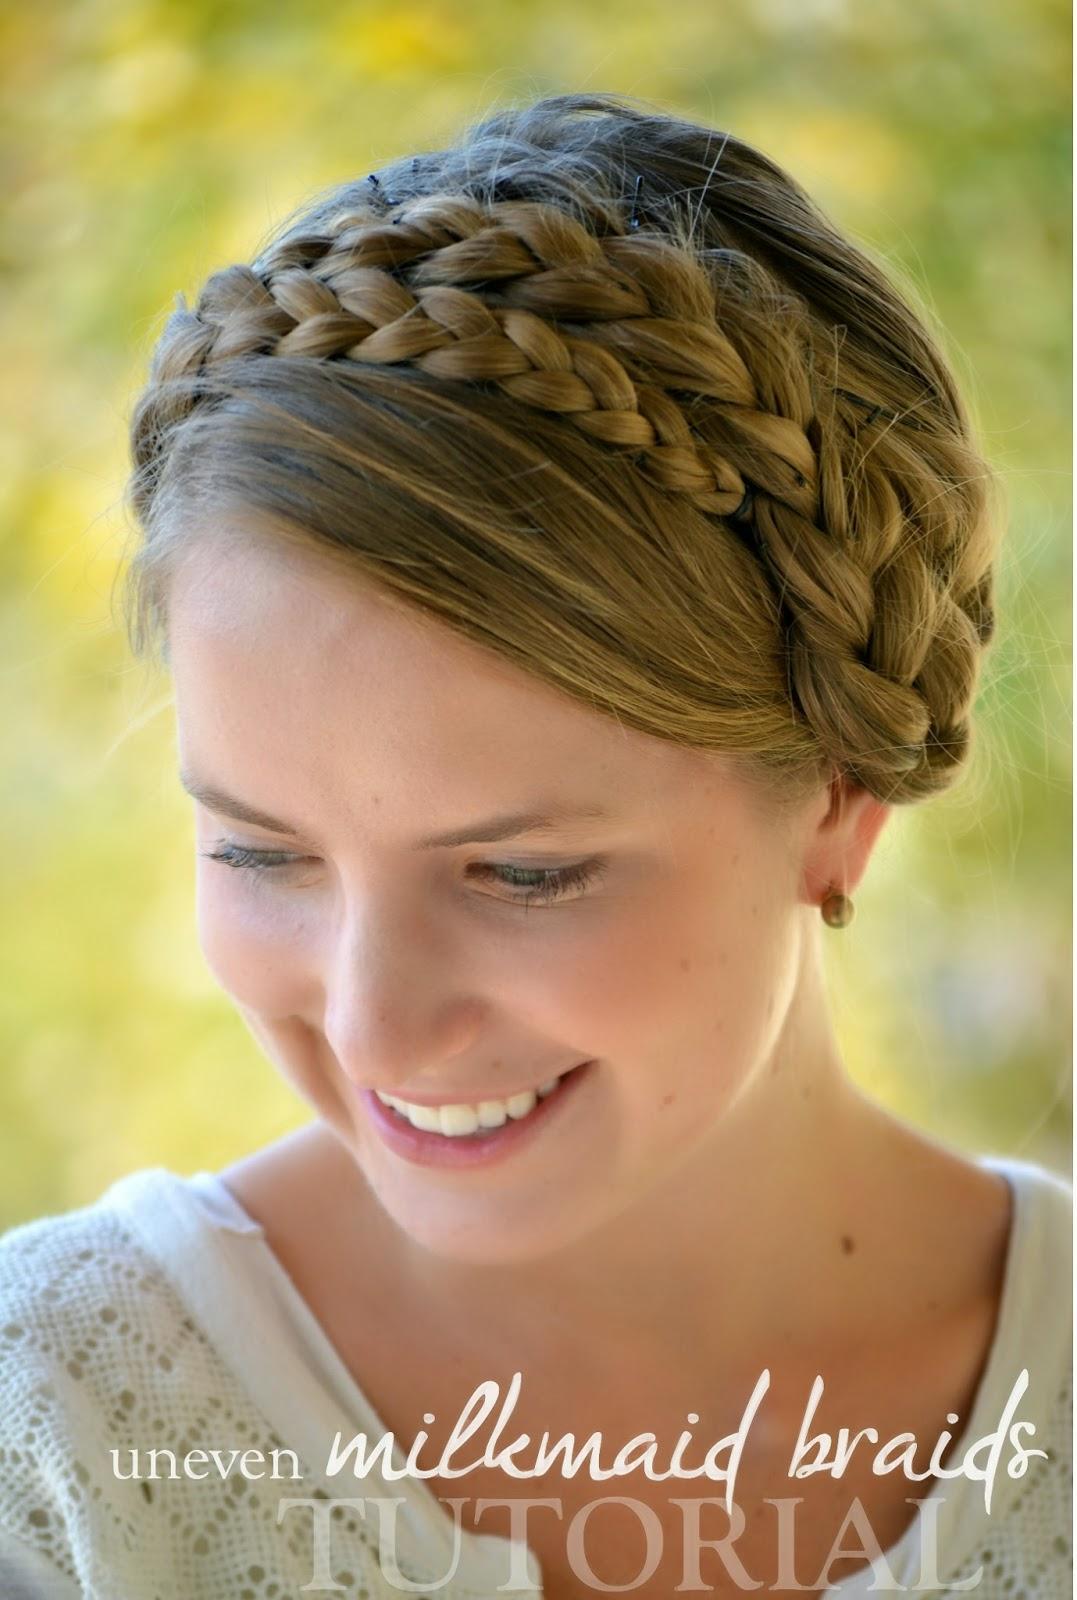 Uneven Milkmaid Braids Tutorial Elisabeth McKnight - Diy hairstyle knotted milkmaid braid